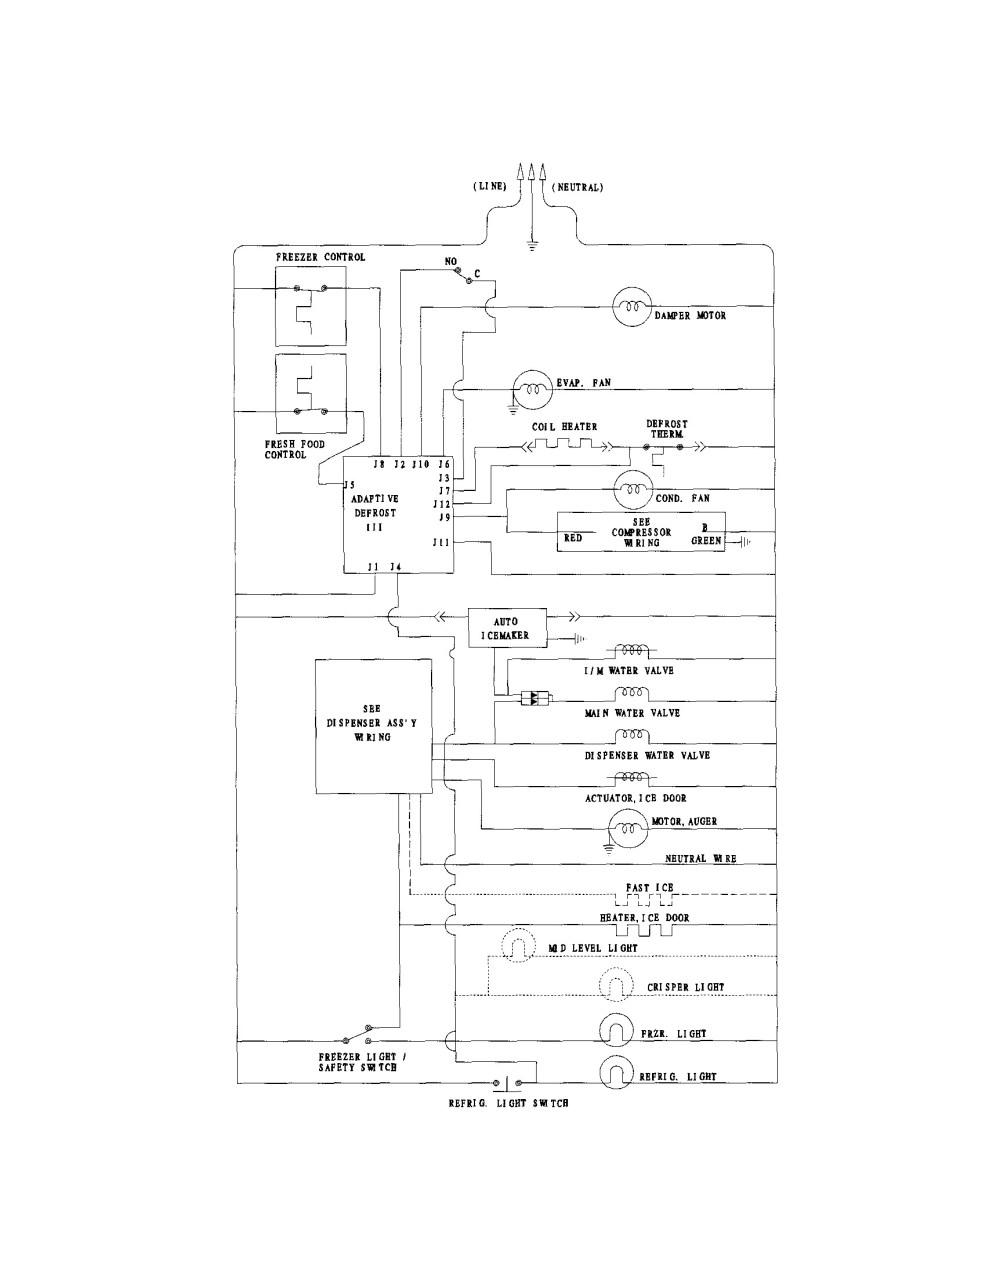 medium resolution of frigidaire ice maker wiring diagram wemo maker wiring diagram buy wemo maker printable wiring diagrams whirlpool refrigerator